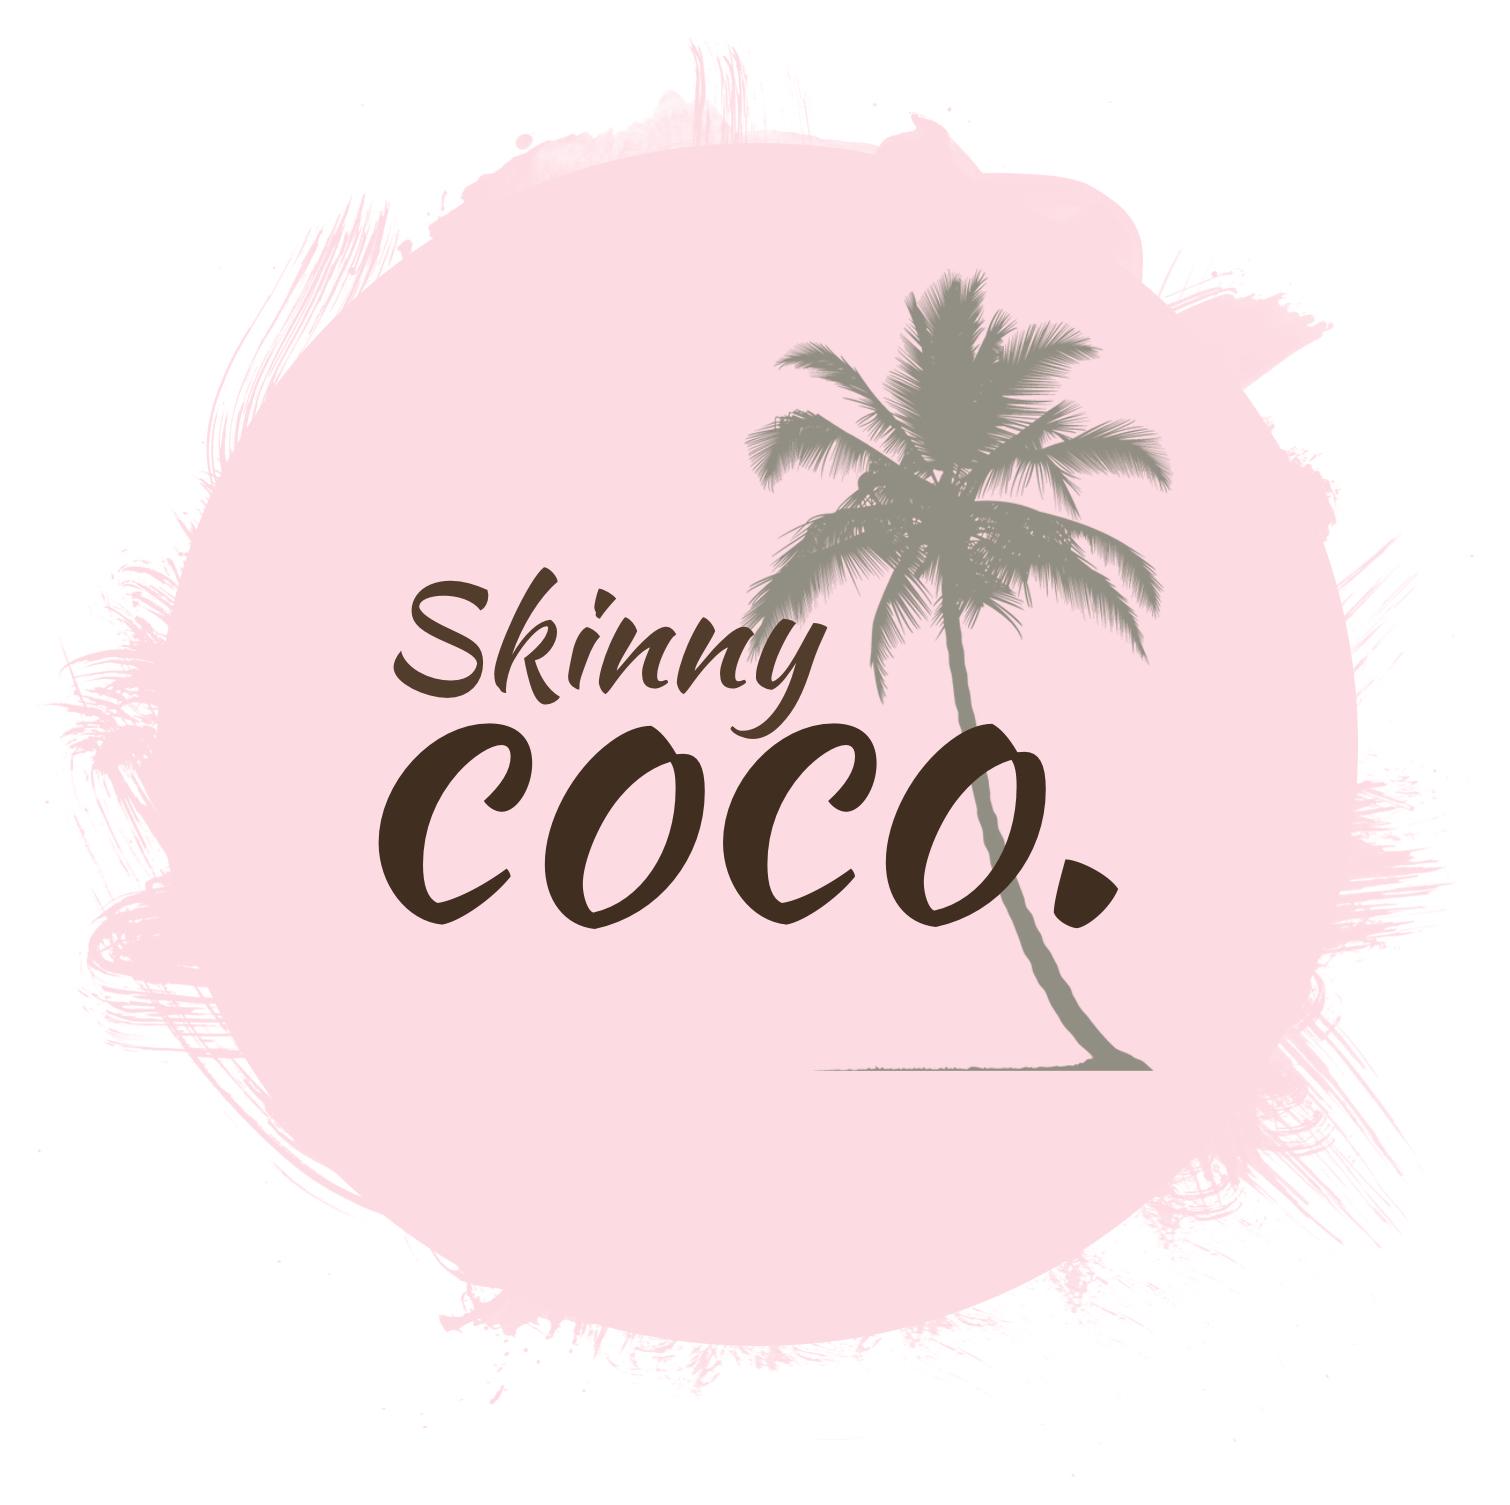 Skinny Coco